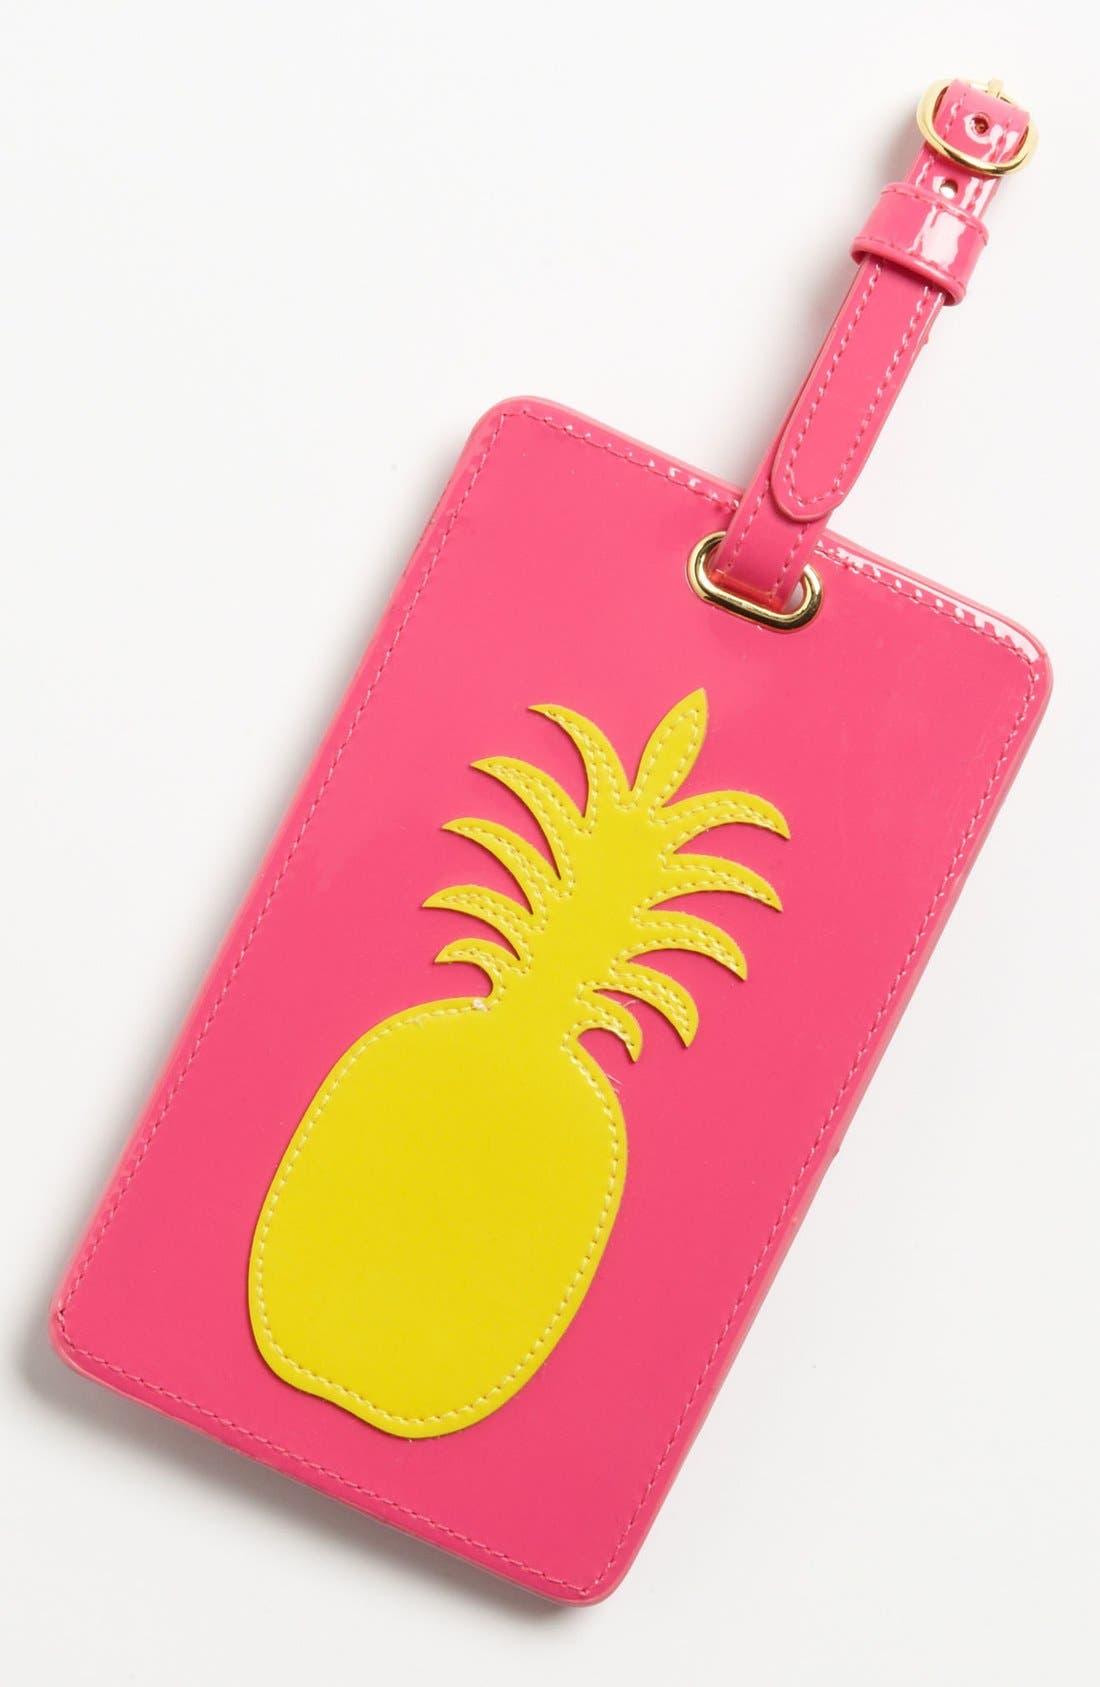 Main Image - Lolo 'Pineapple' Luggage Tag